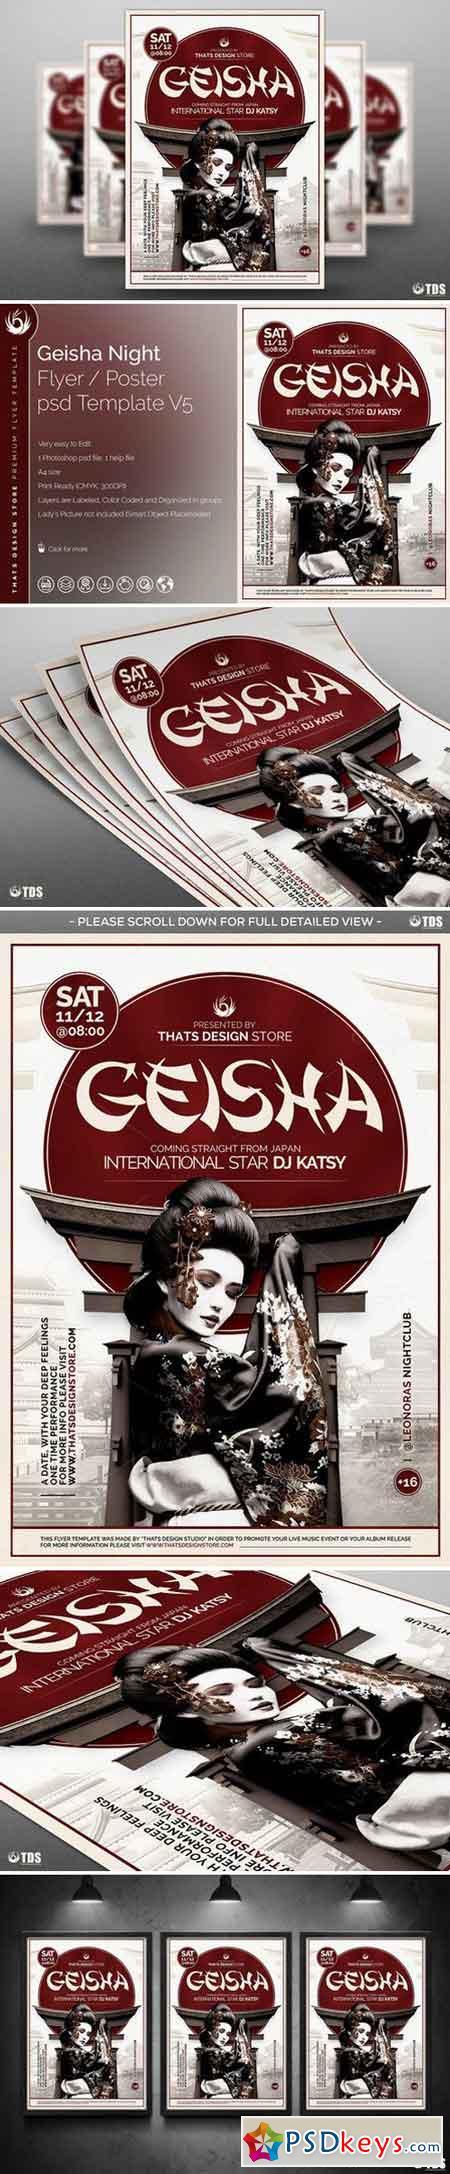 Geisha Night Flyer Template V5 733576